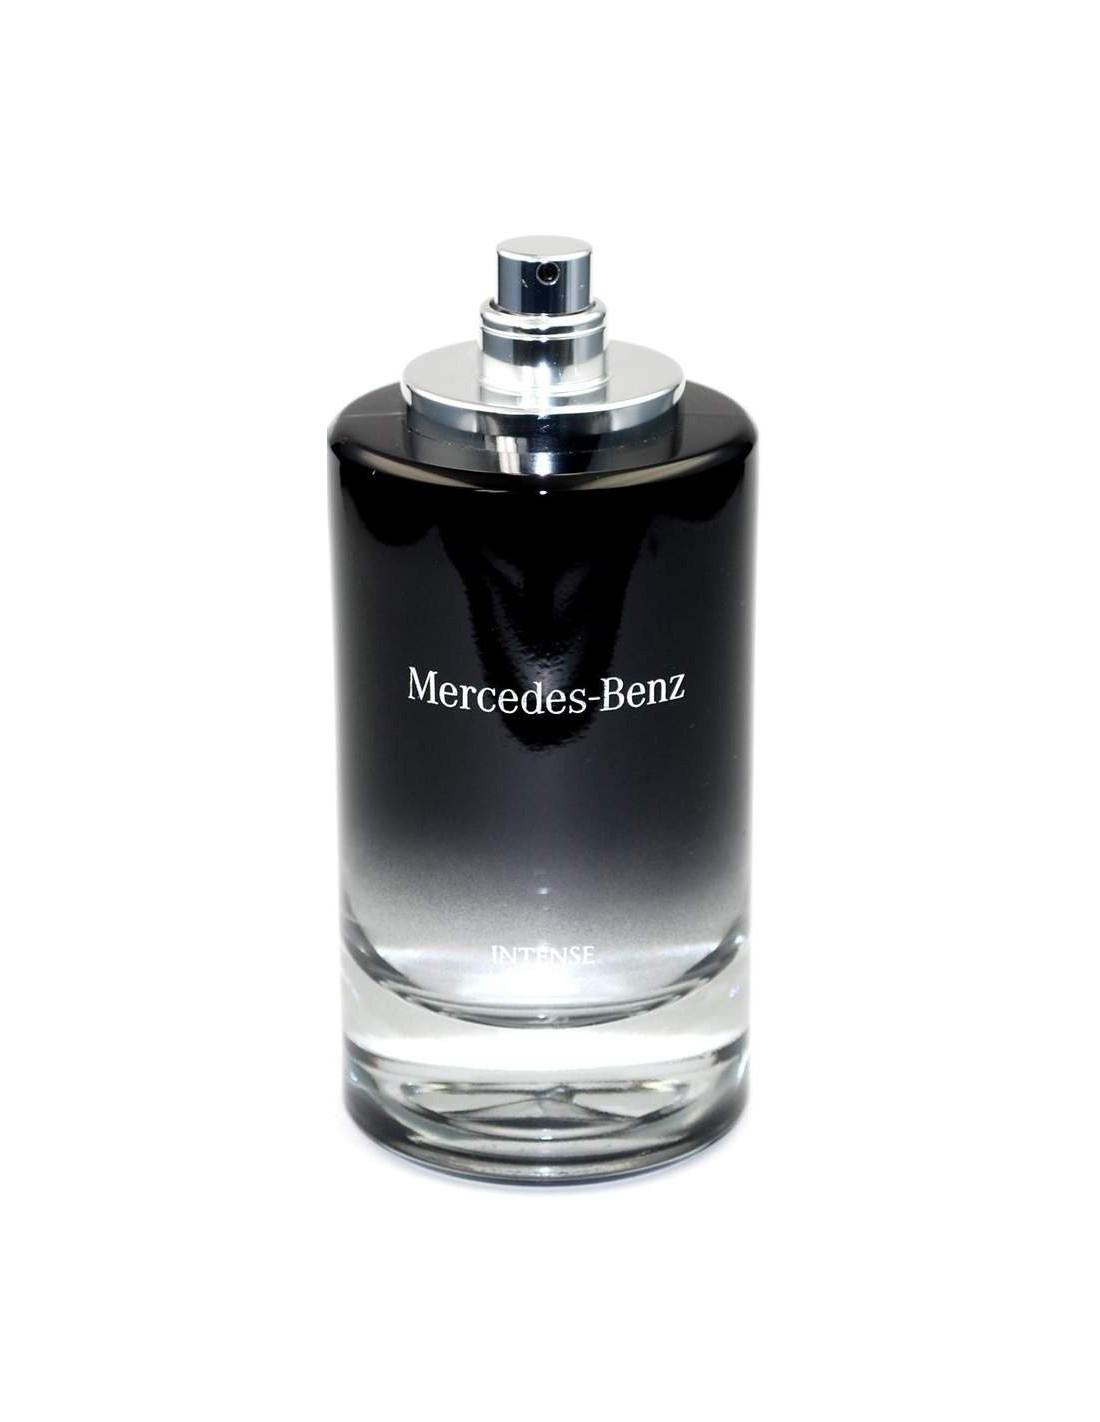 تستر عطر مرسدس بنز اینتنس مردانه Mercedes Benz Intense اصل